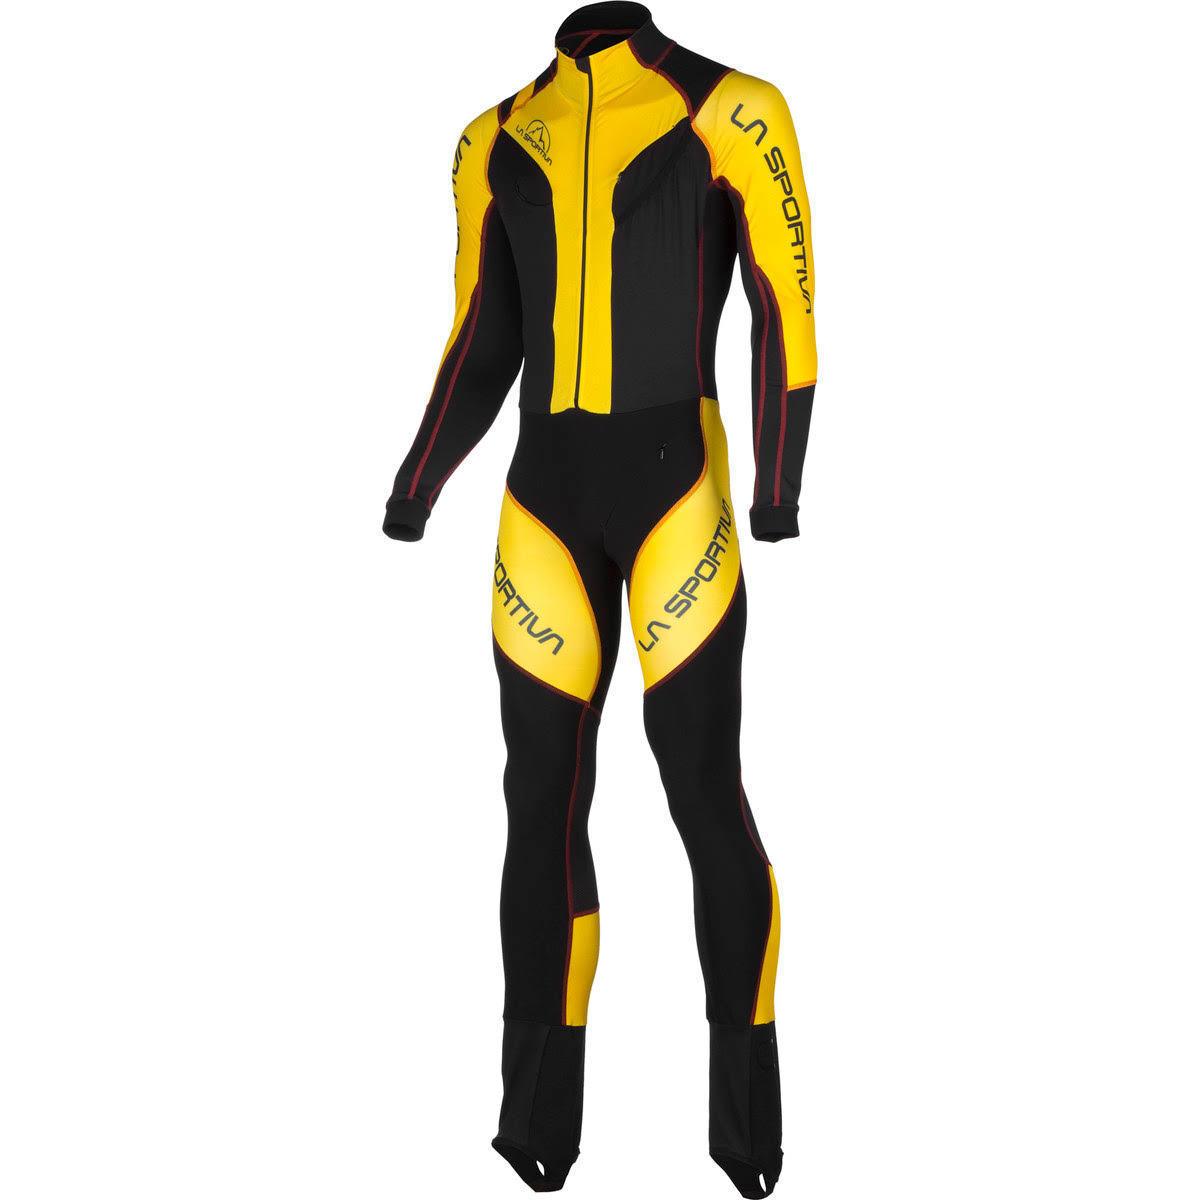 La Sportiva Syborg Racing Suit (S) Giallo Grigio